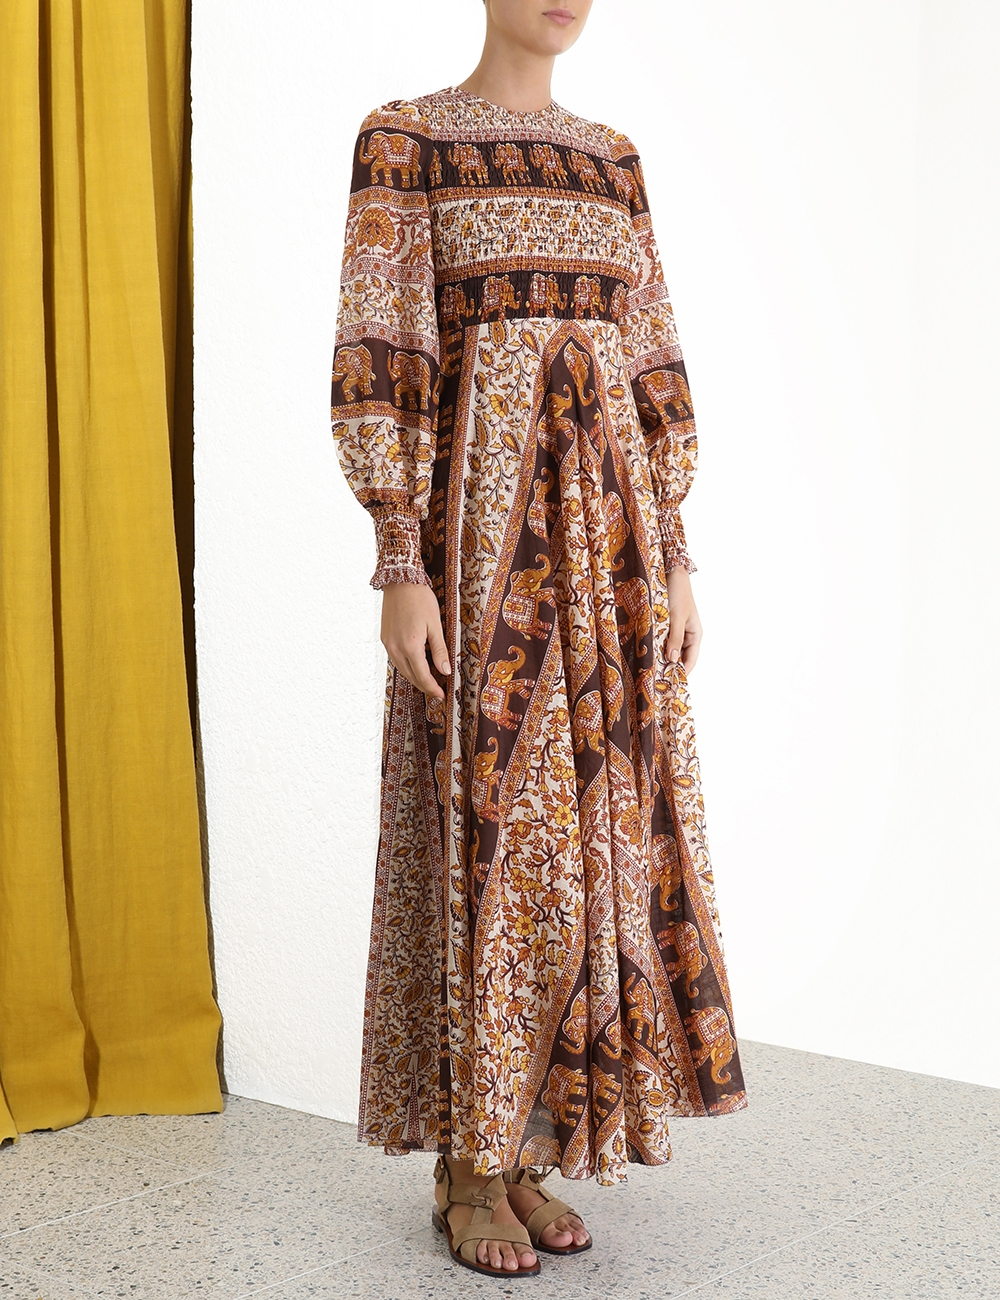 Suraya Shirred Chevron Dress